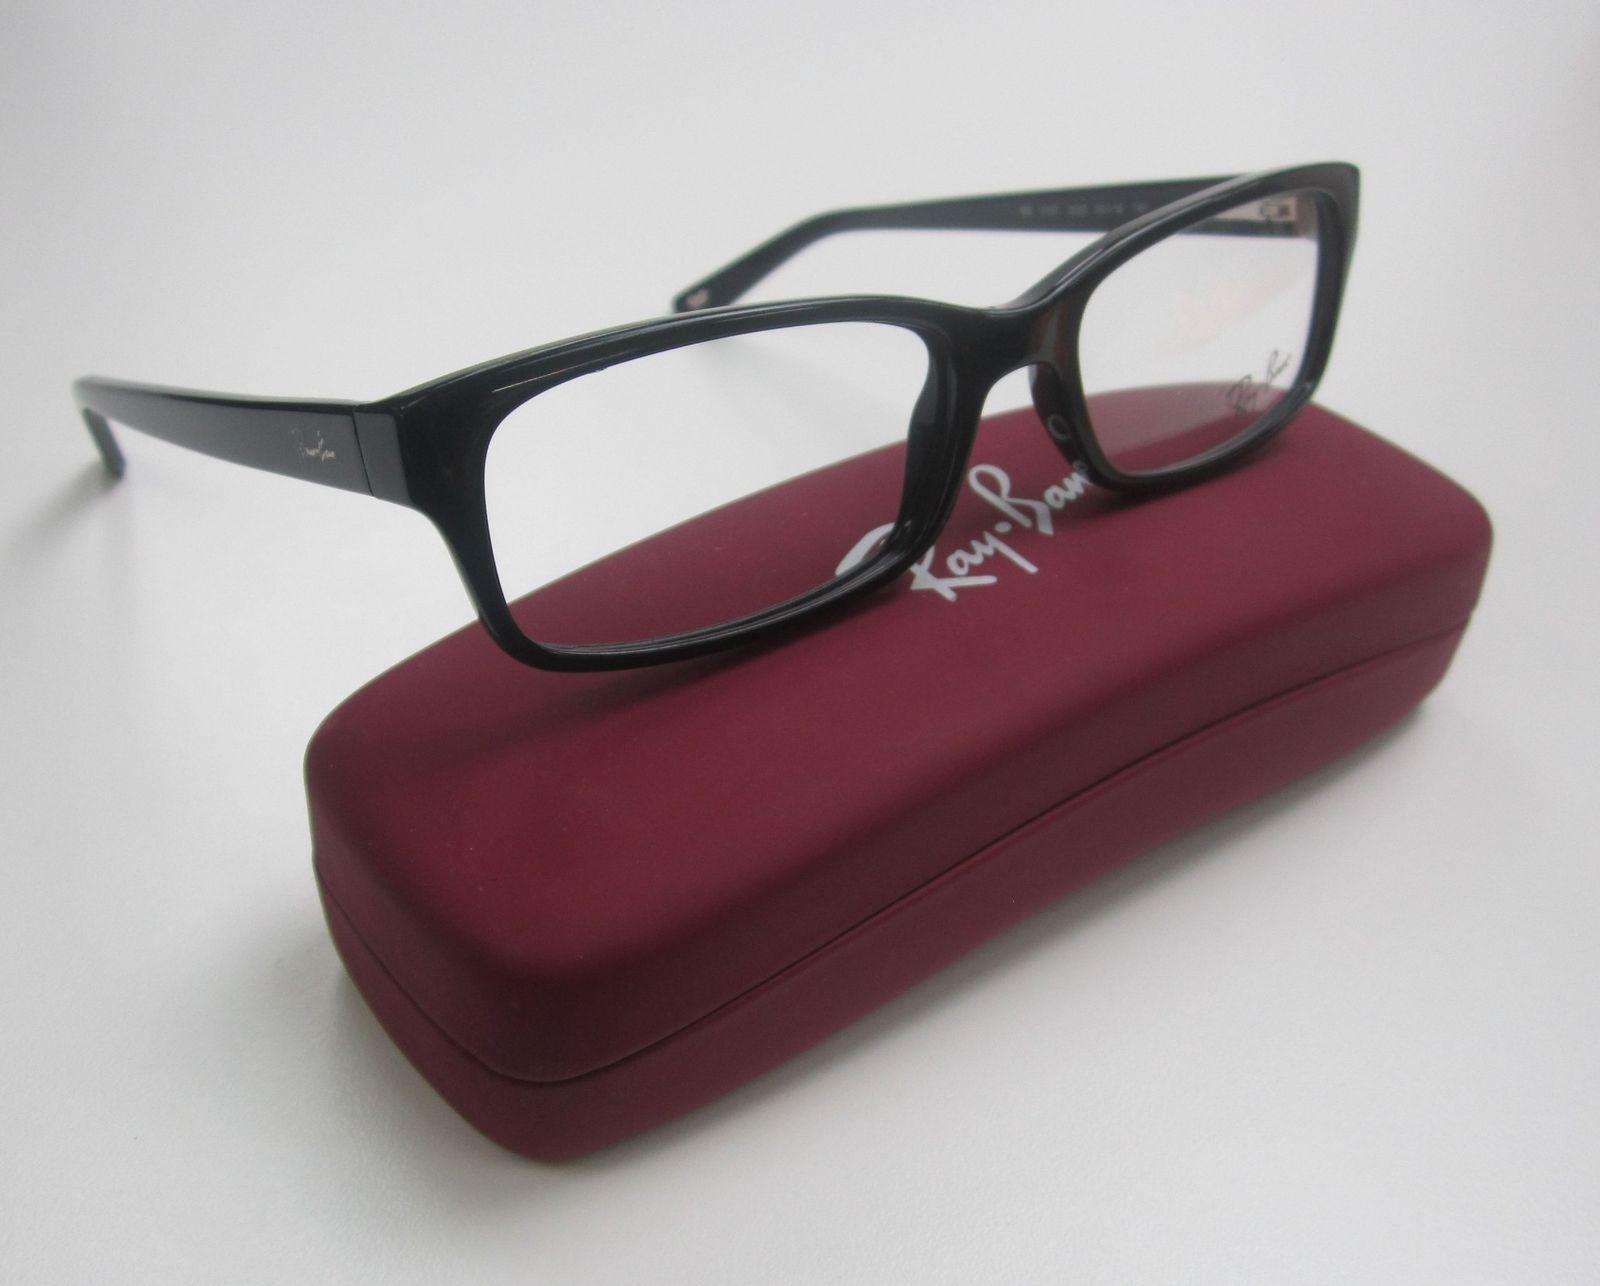 793bd9fe0b RayBan RB 5187 2000 Eyeglasses 52 16 140 and 50 similar items